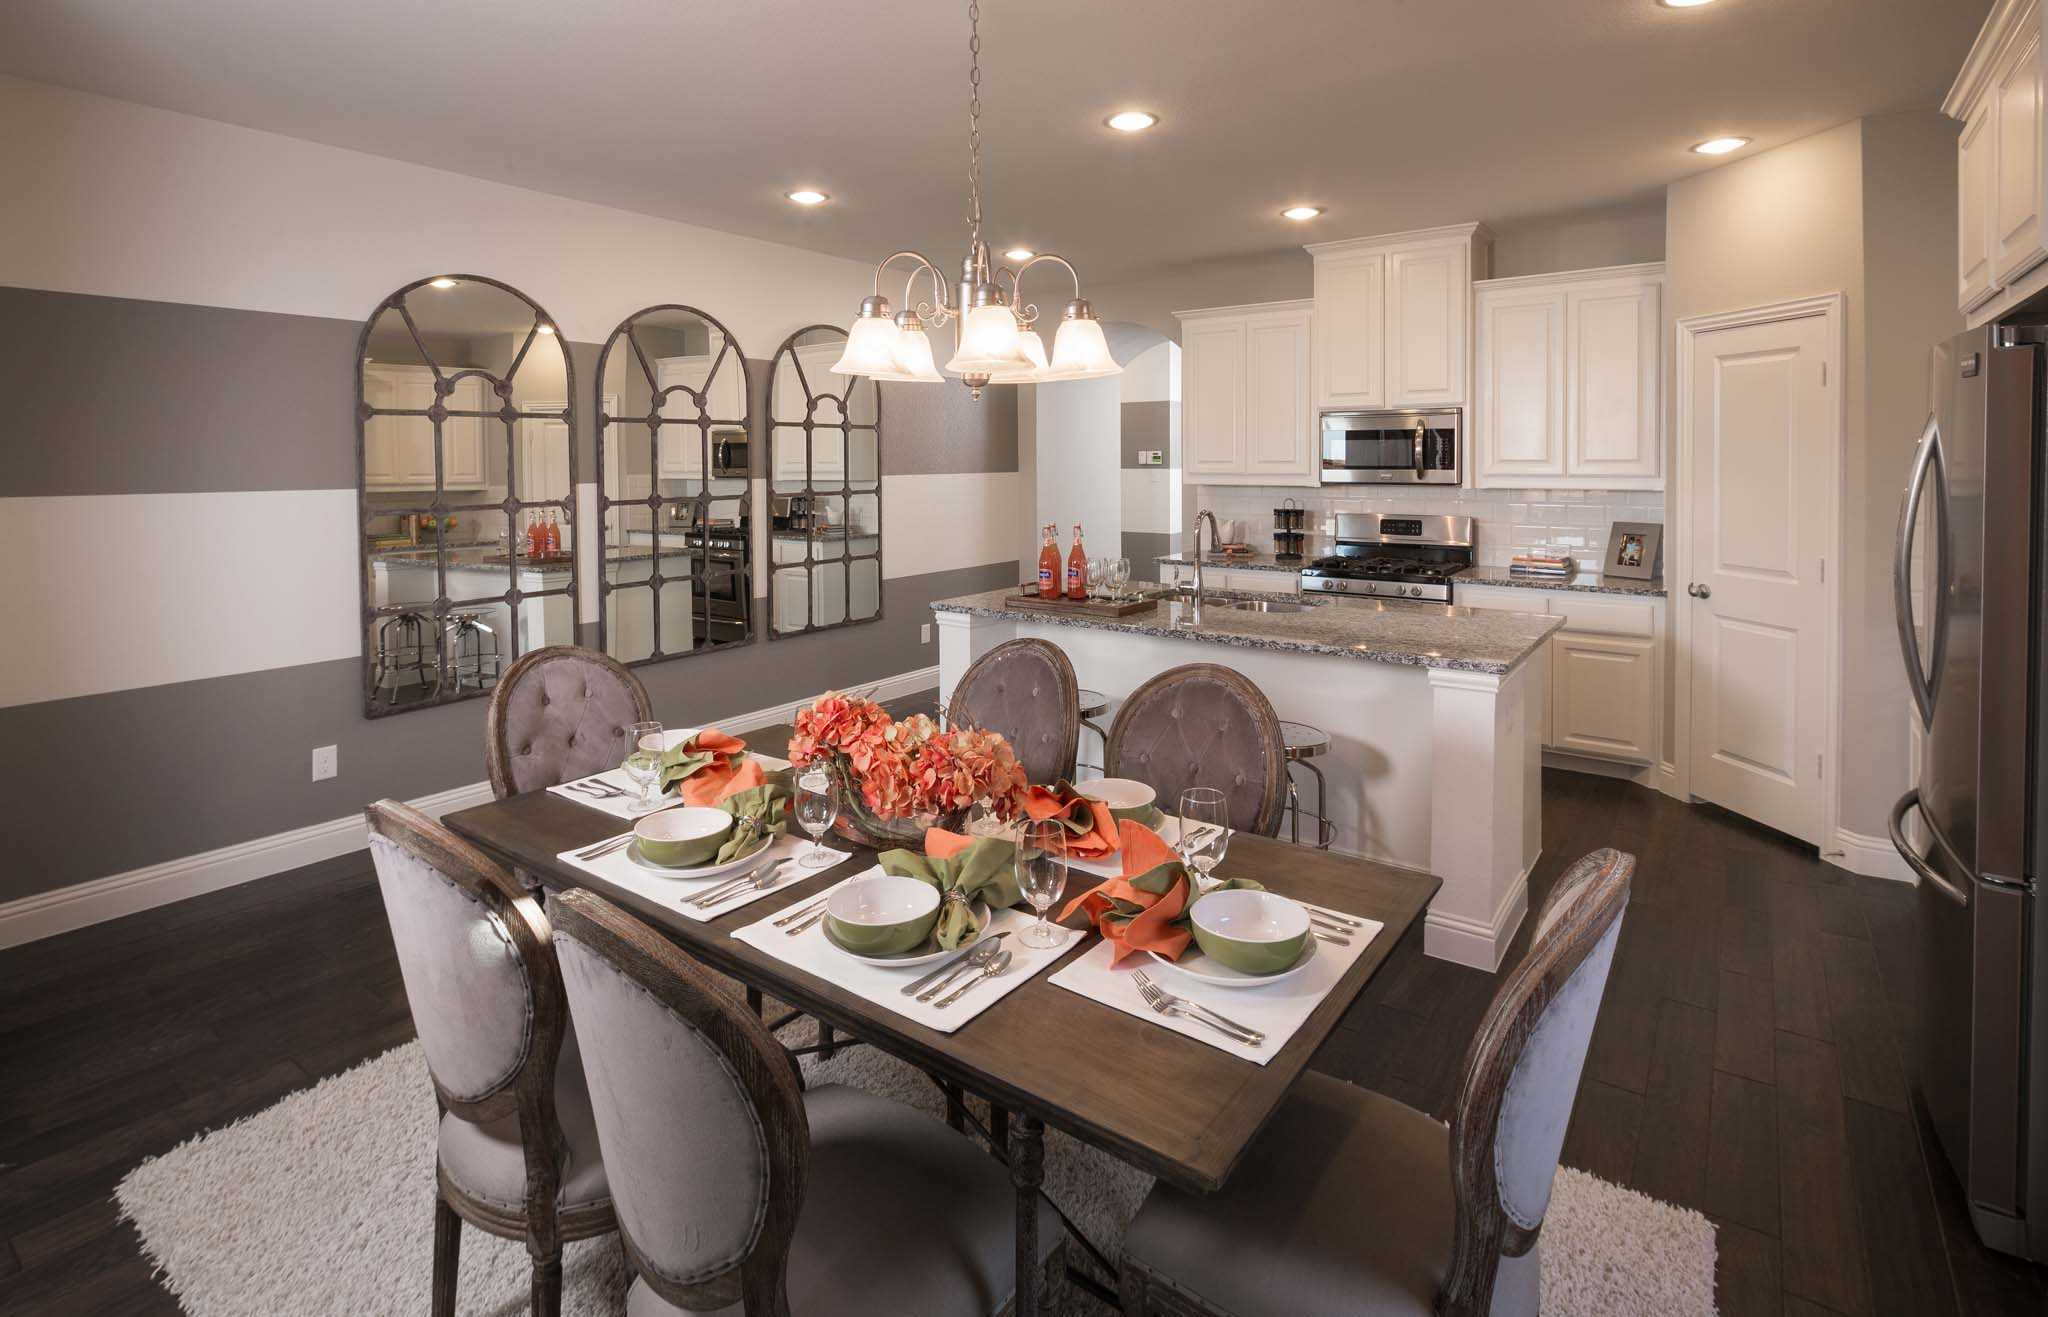 New Home Plan 557 in Richmond, TX 77407